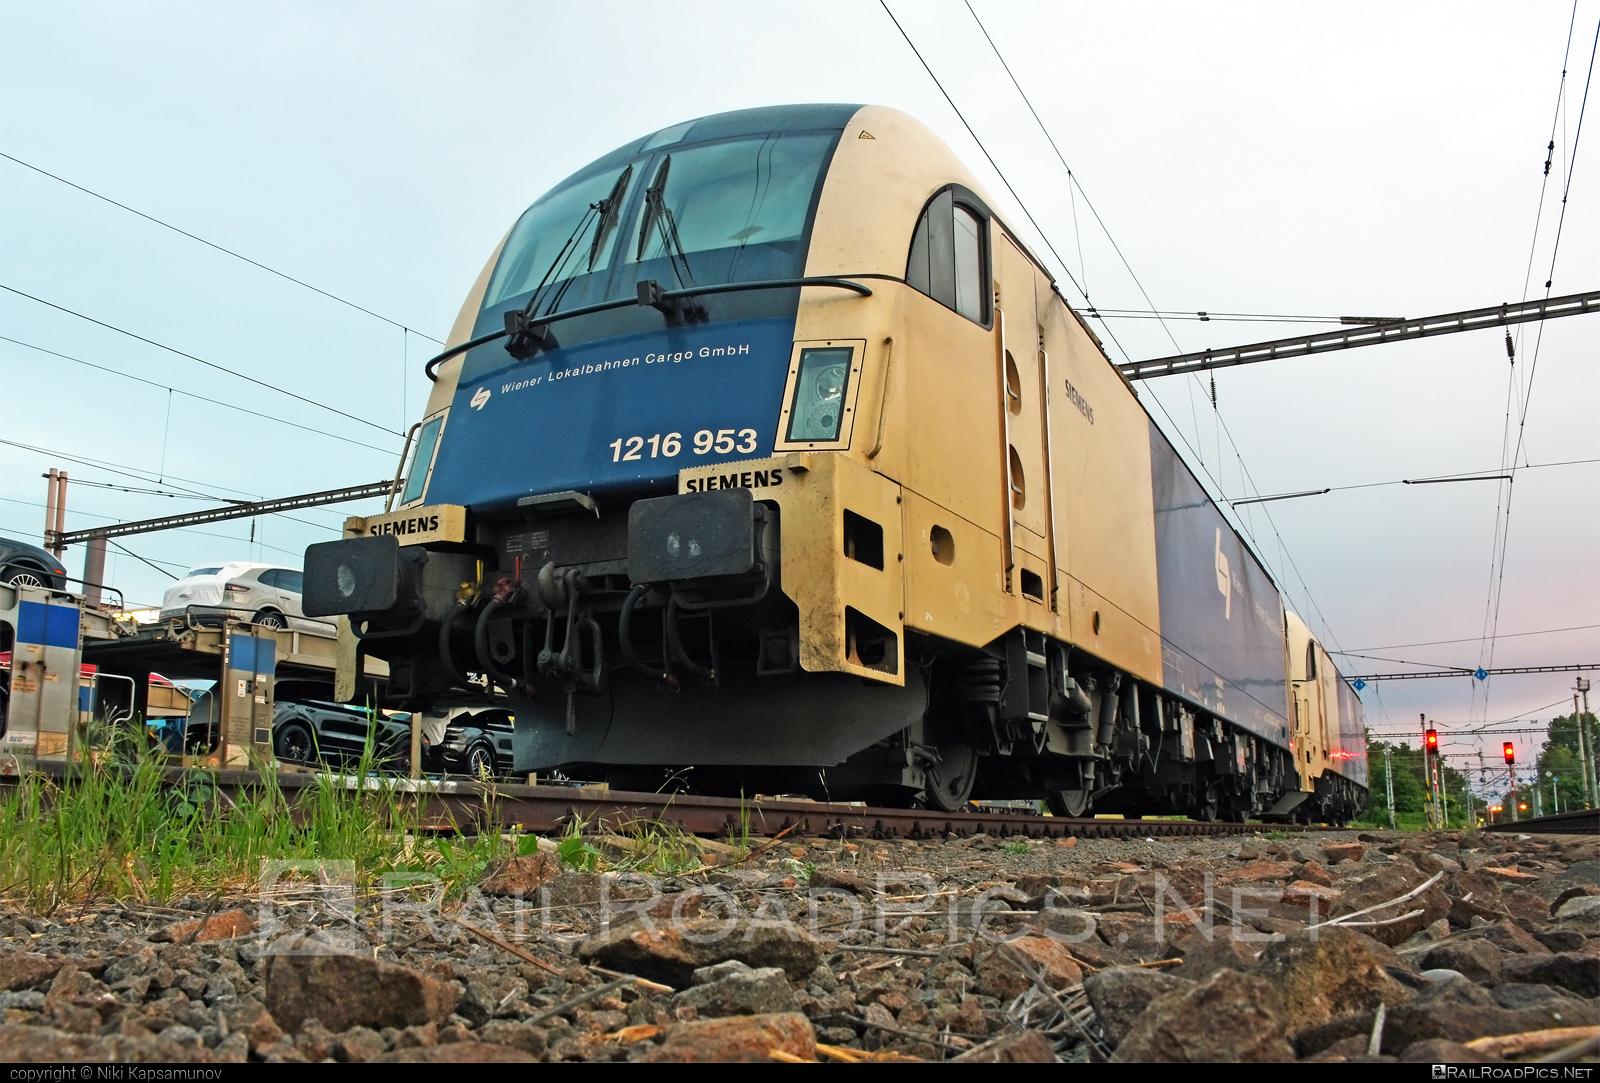 Siemens ES 64 U4 - 1216 953 operated by Wiener Lokalbahnen Cargo GmbH #es64 #es64u #es64u4 #eurosprinter #siemens #siemenses64 #siemenses64u #siemenses64u4 #siemenstaurus #taurus #tauruslocomotive #wienerlokalbahnencargo #wienerlokalbahnencargogmbh #wlc